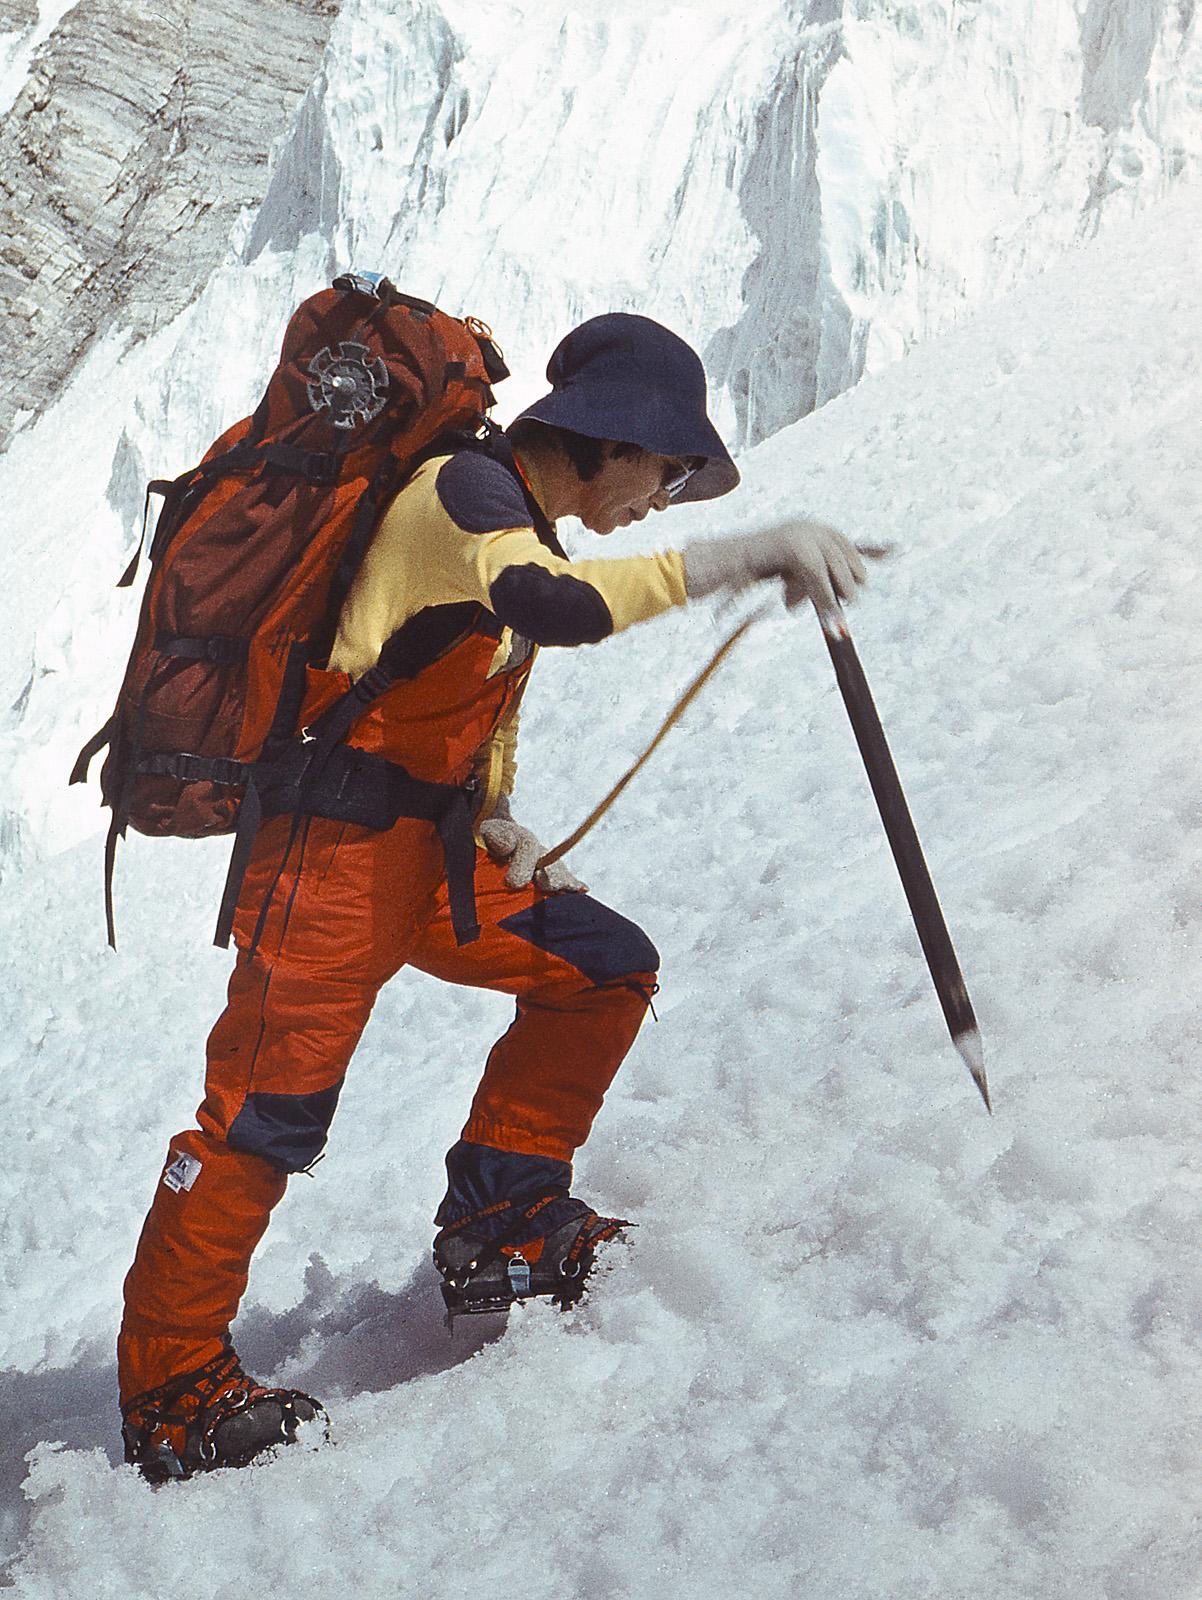 Junko Tabei climbs Somoni Peak (7495m), formerly known as Communism Peak, in 1985. [Photo] Jaan Kunnap